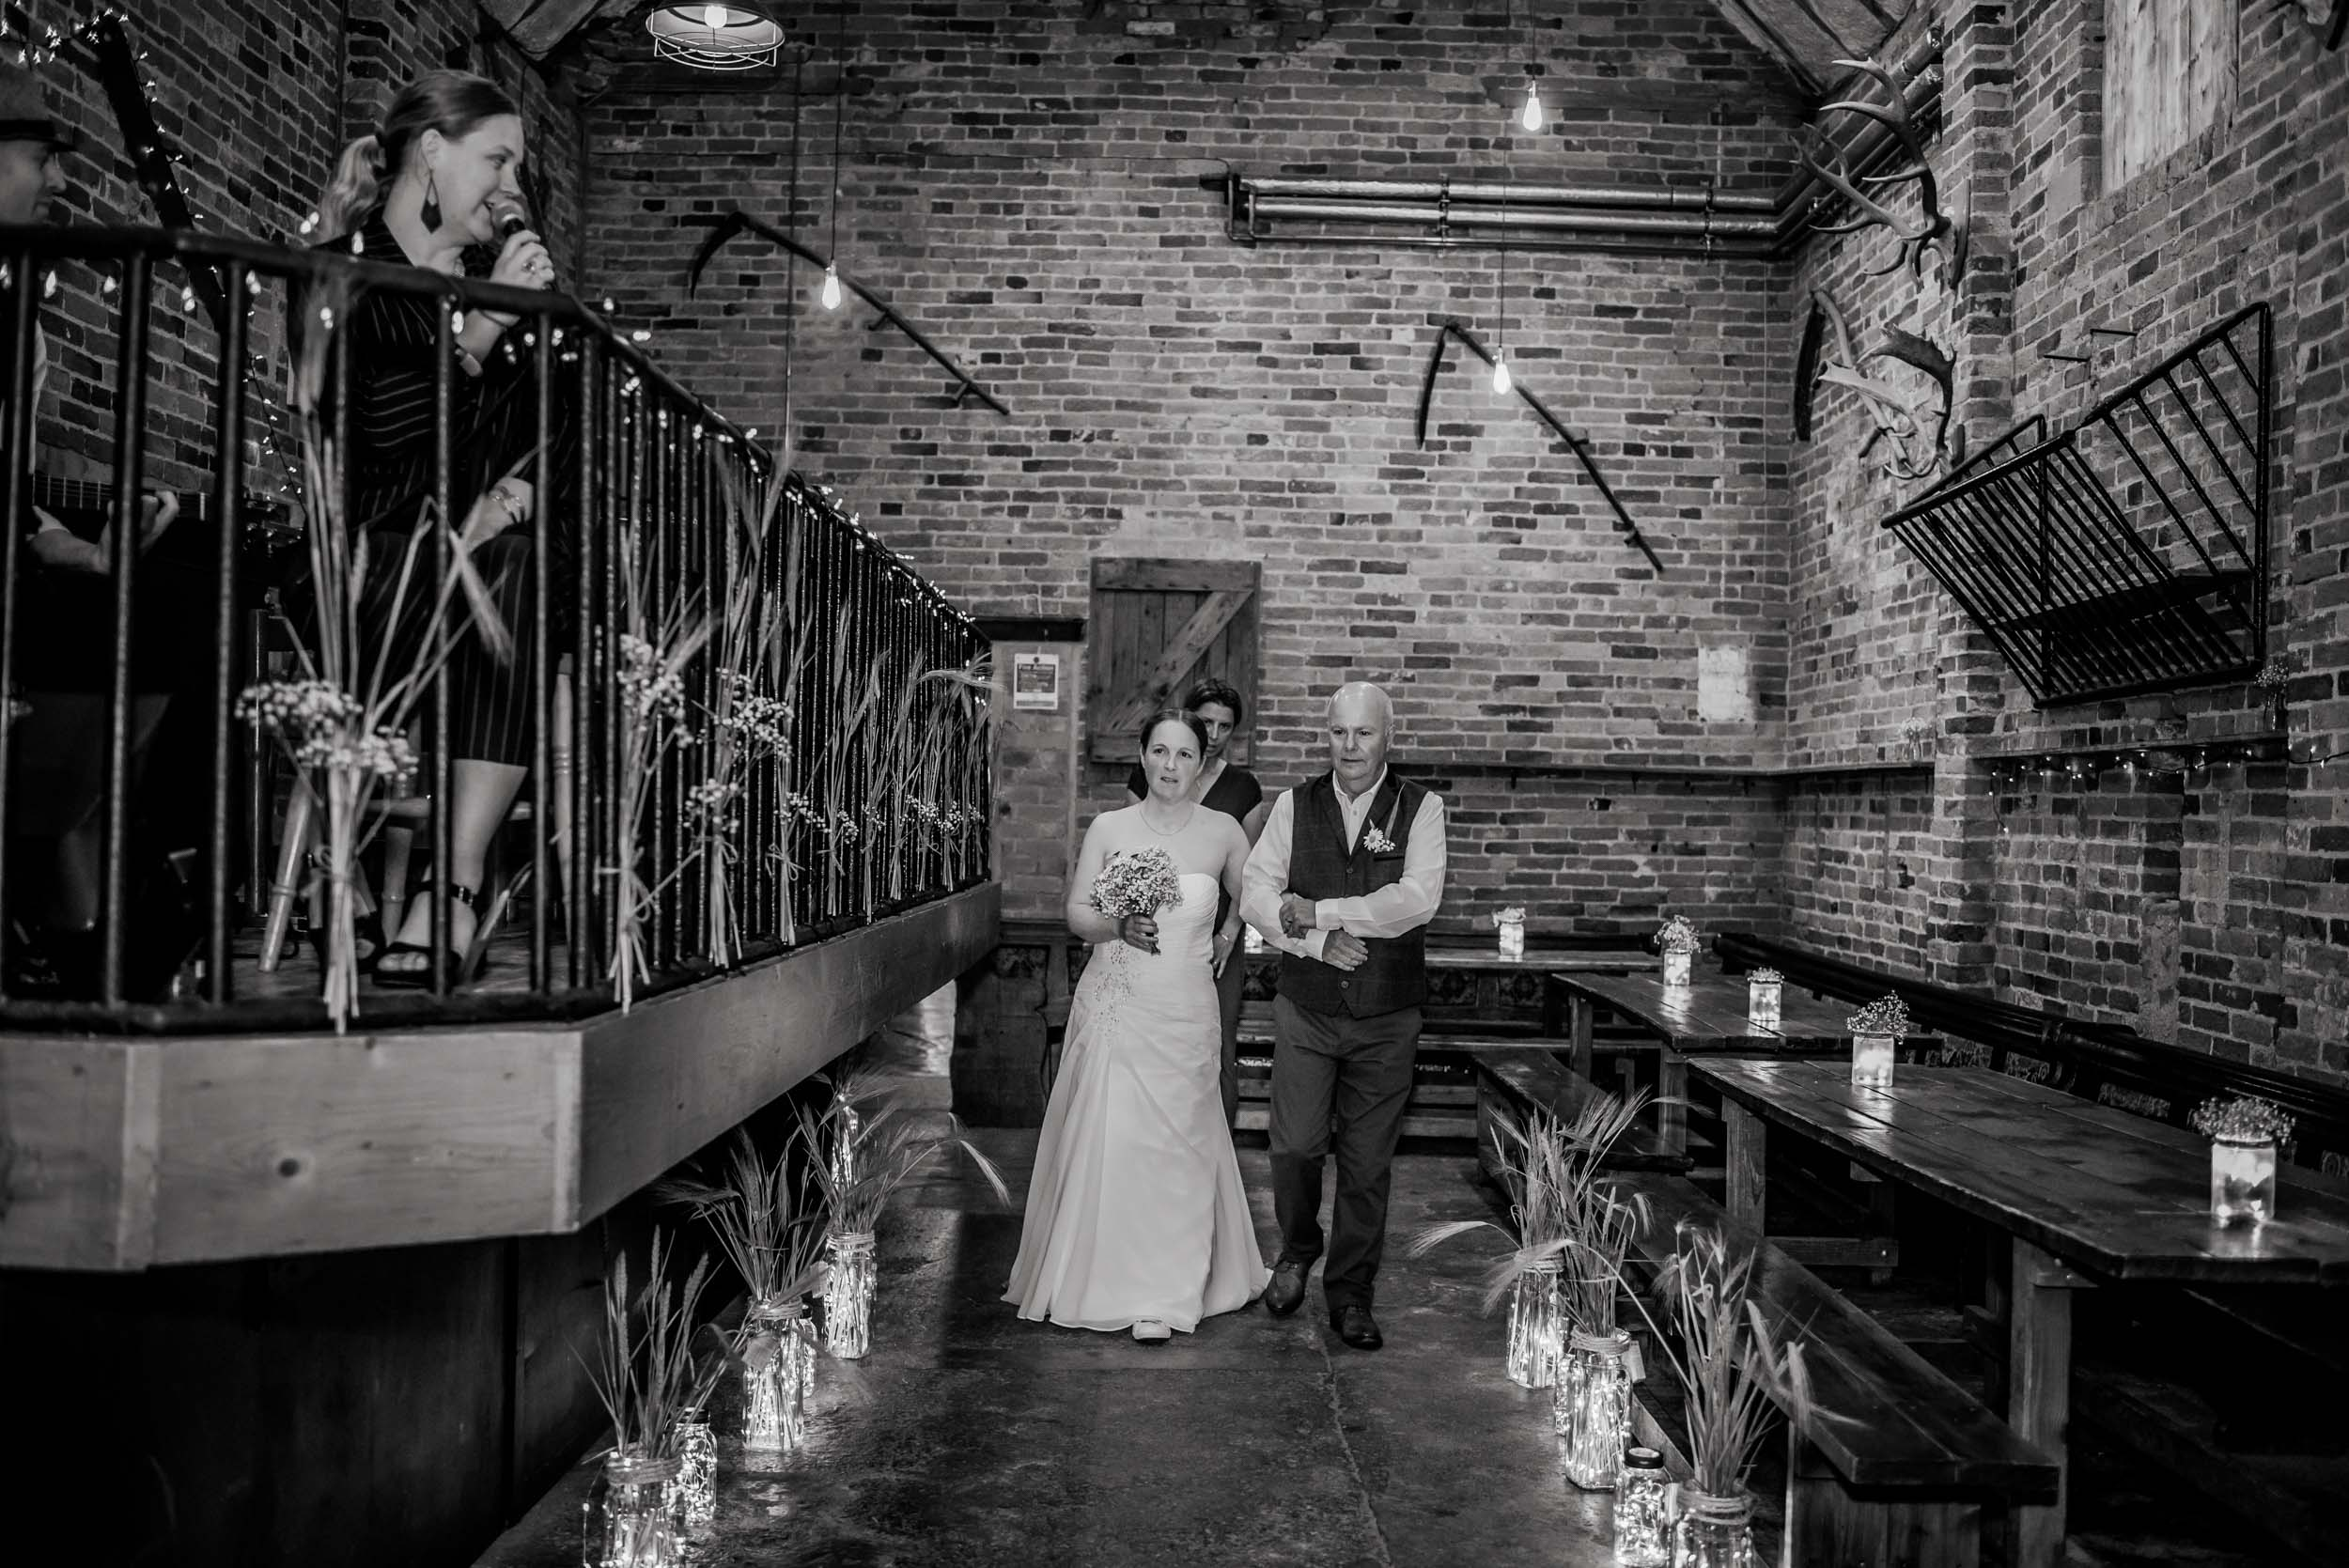 Donington-park-farm-wedding-photography-108.jpg